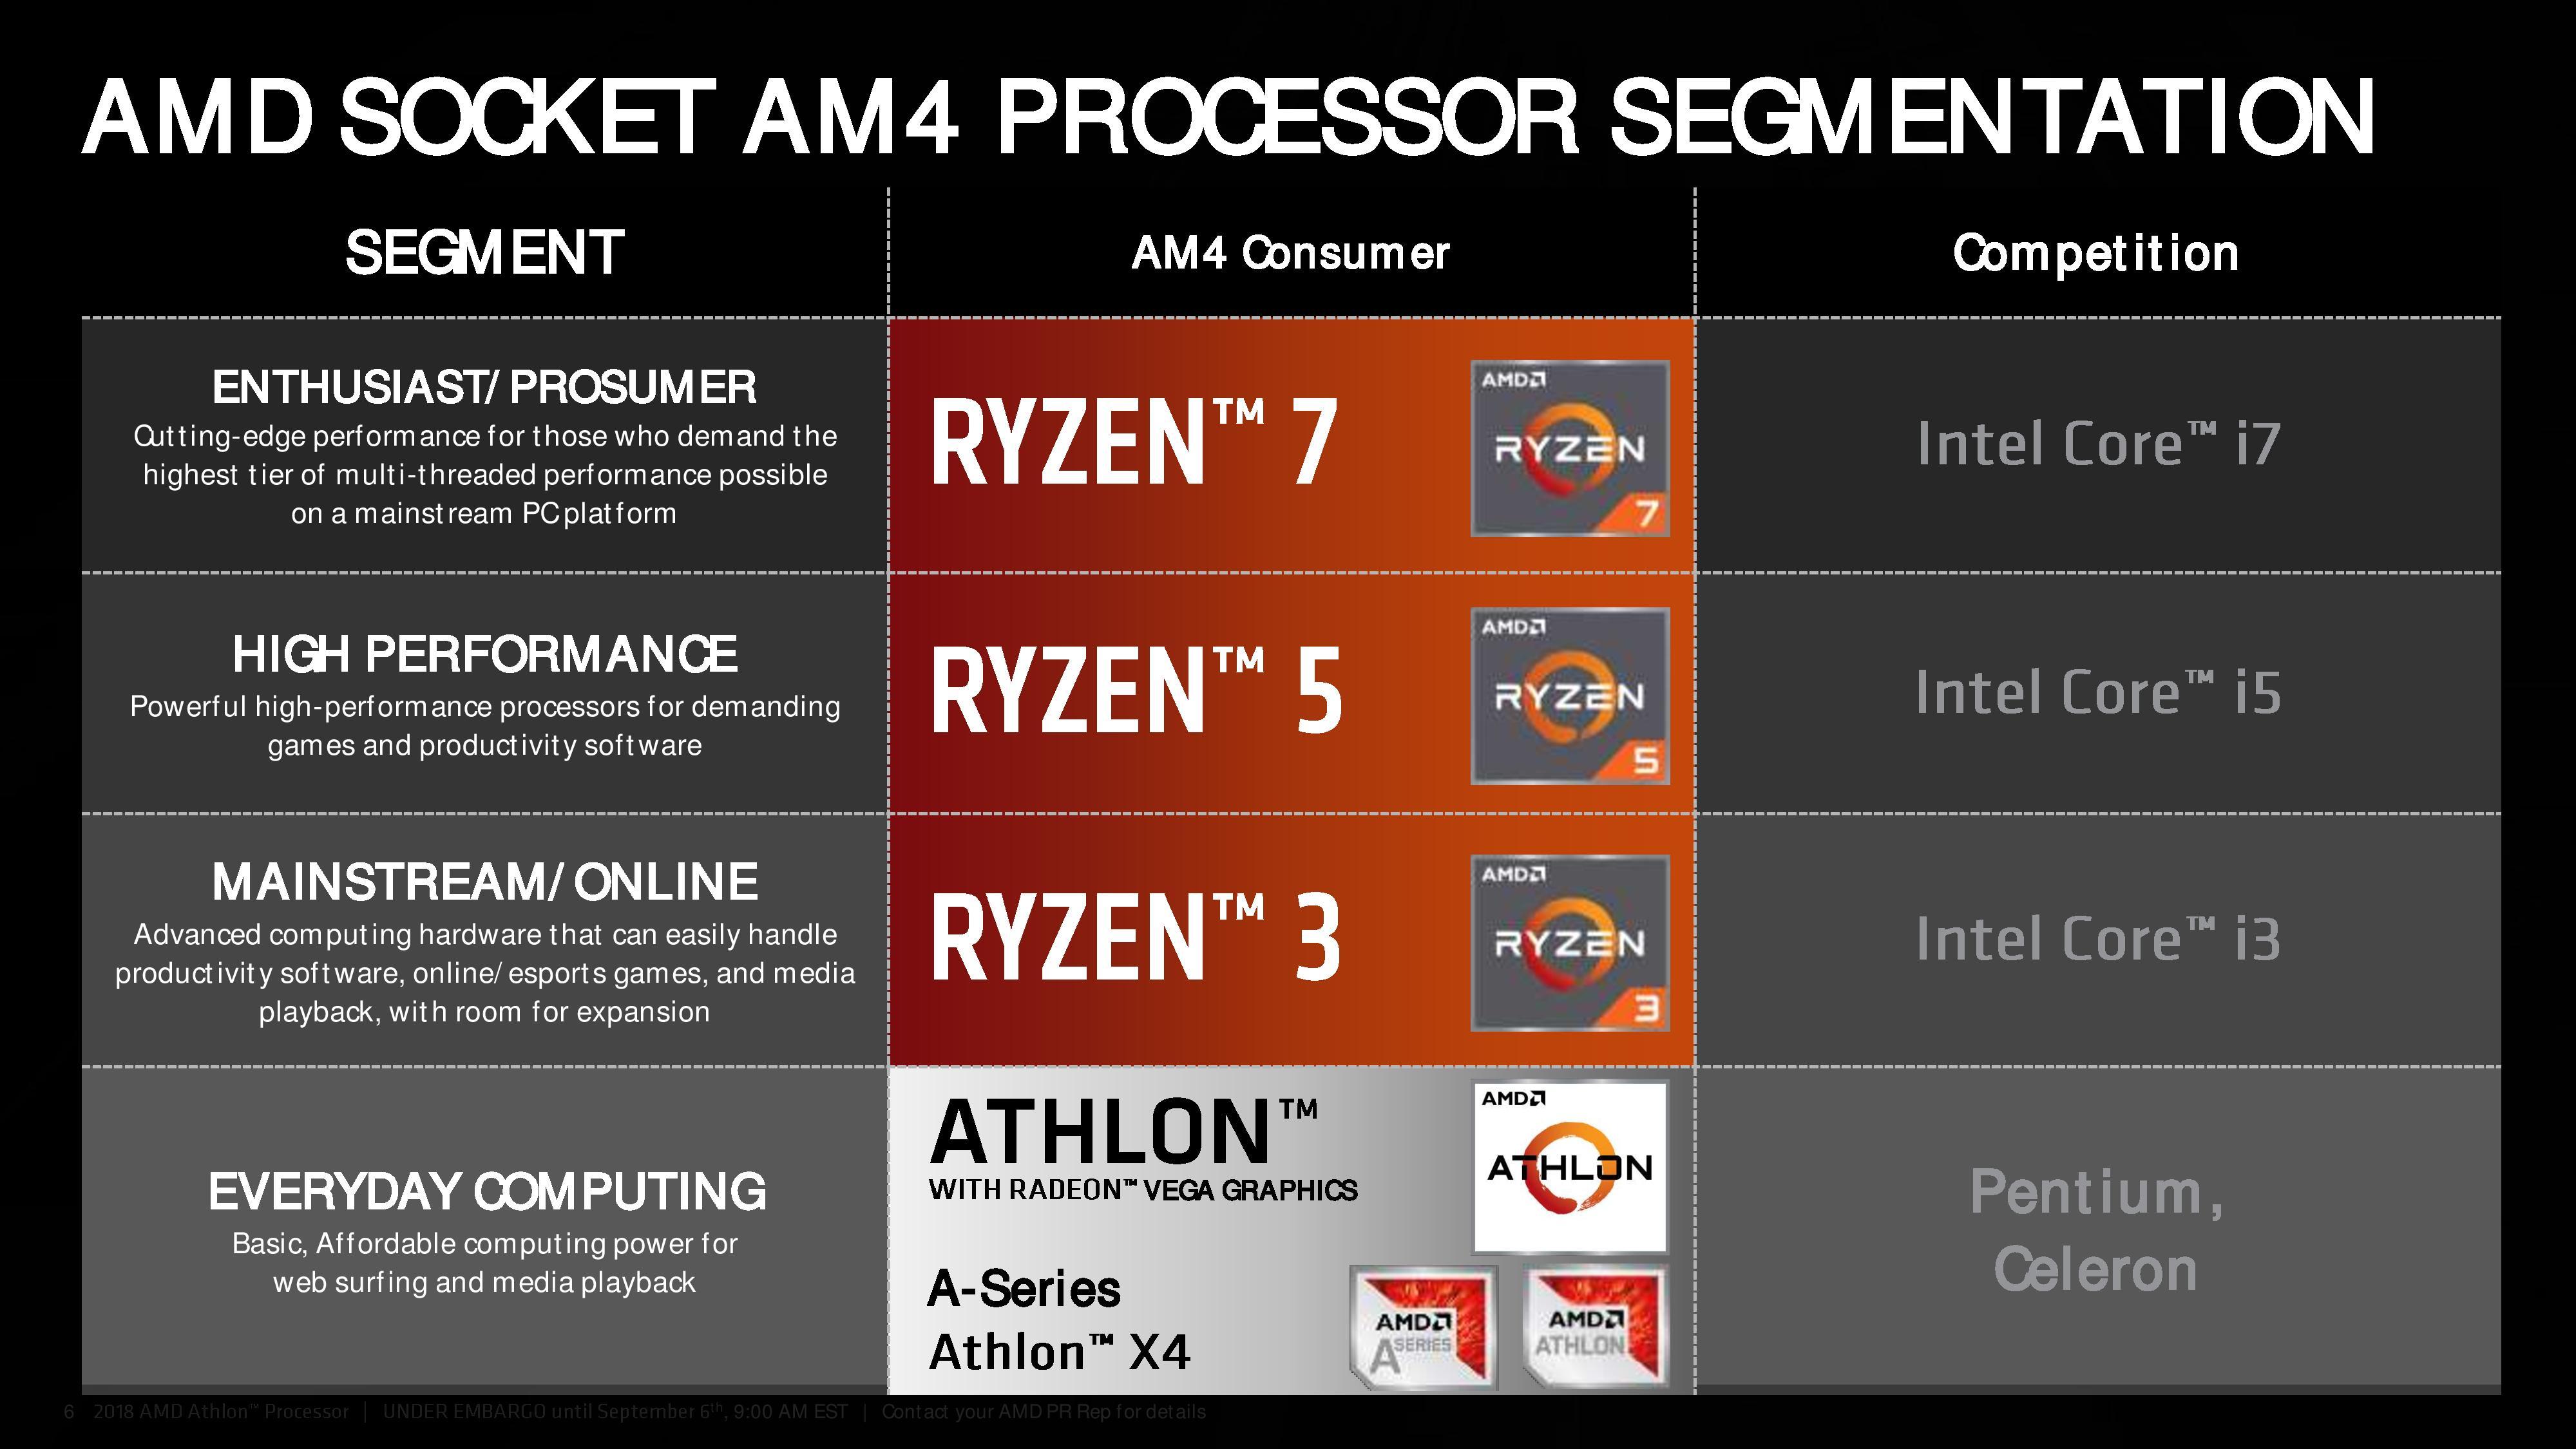 Amd Announces New 55 Low Power Processor Athlon 200ge